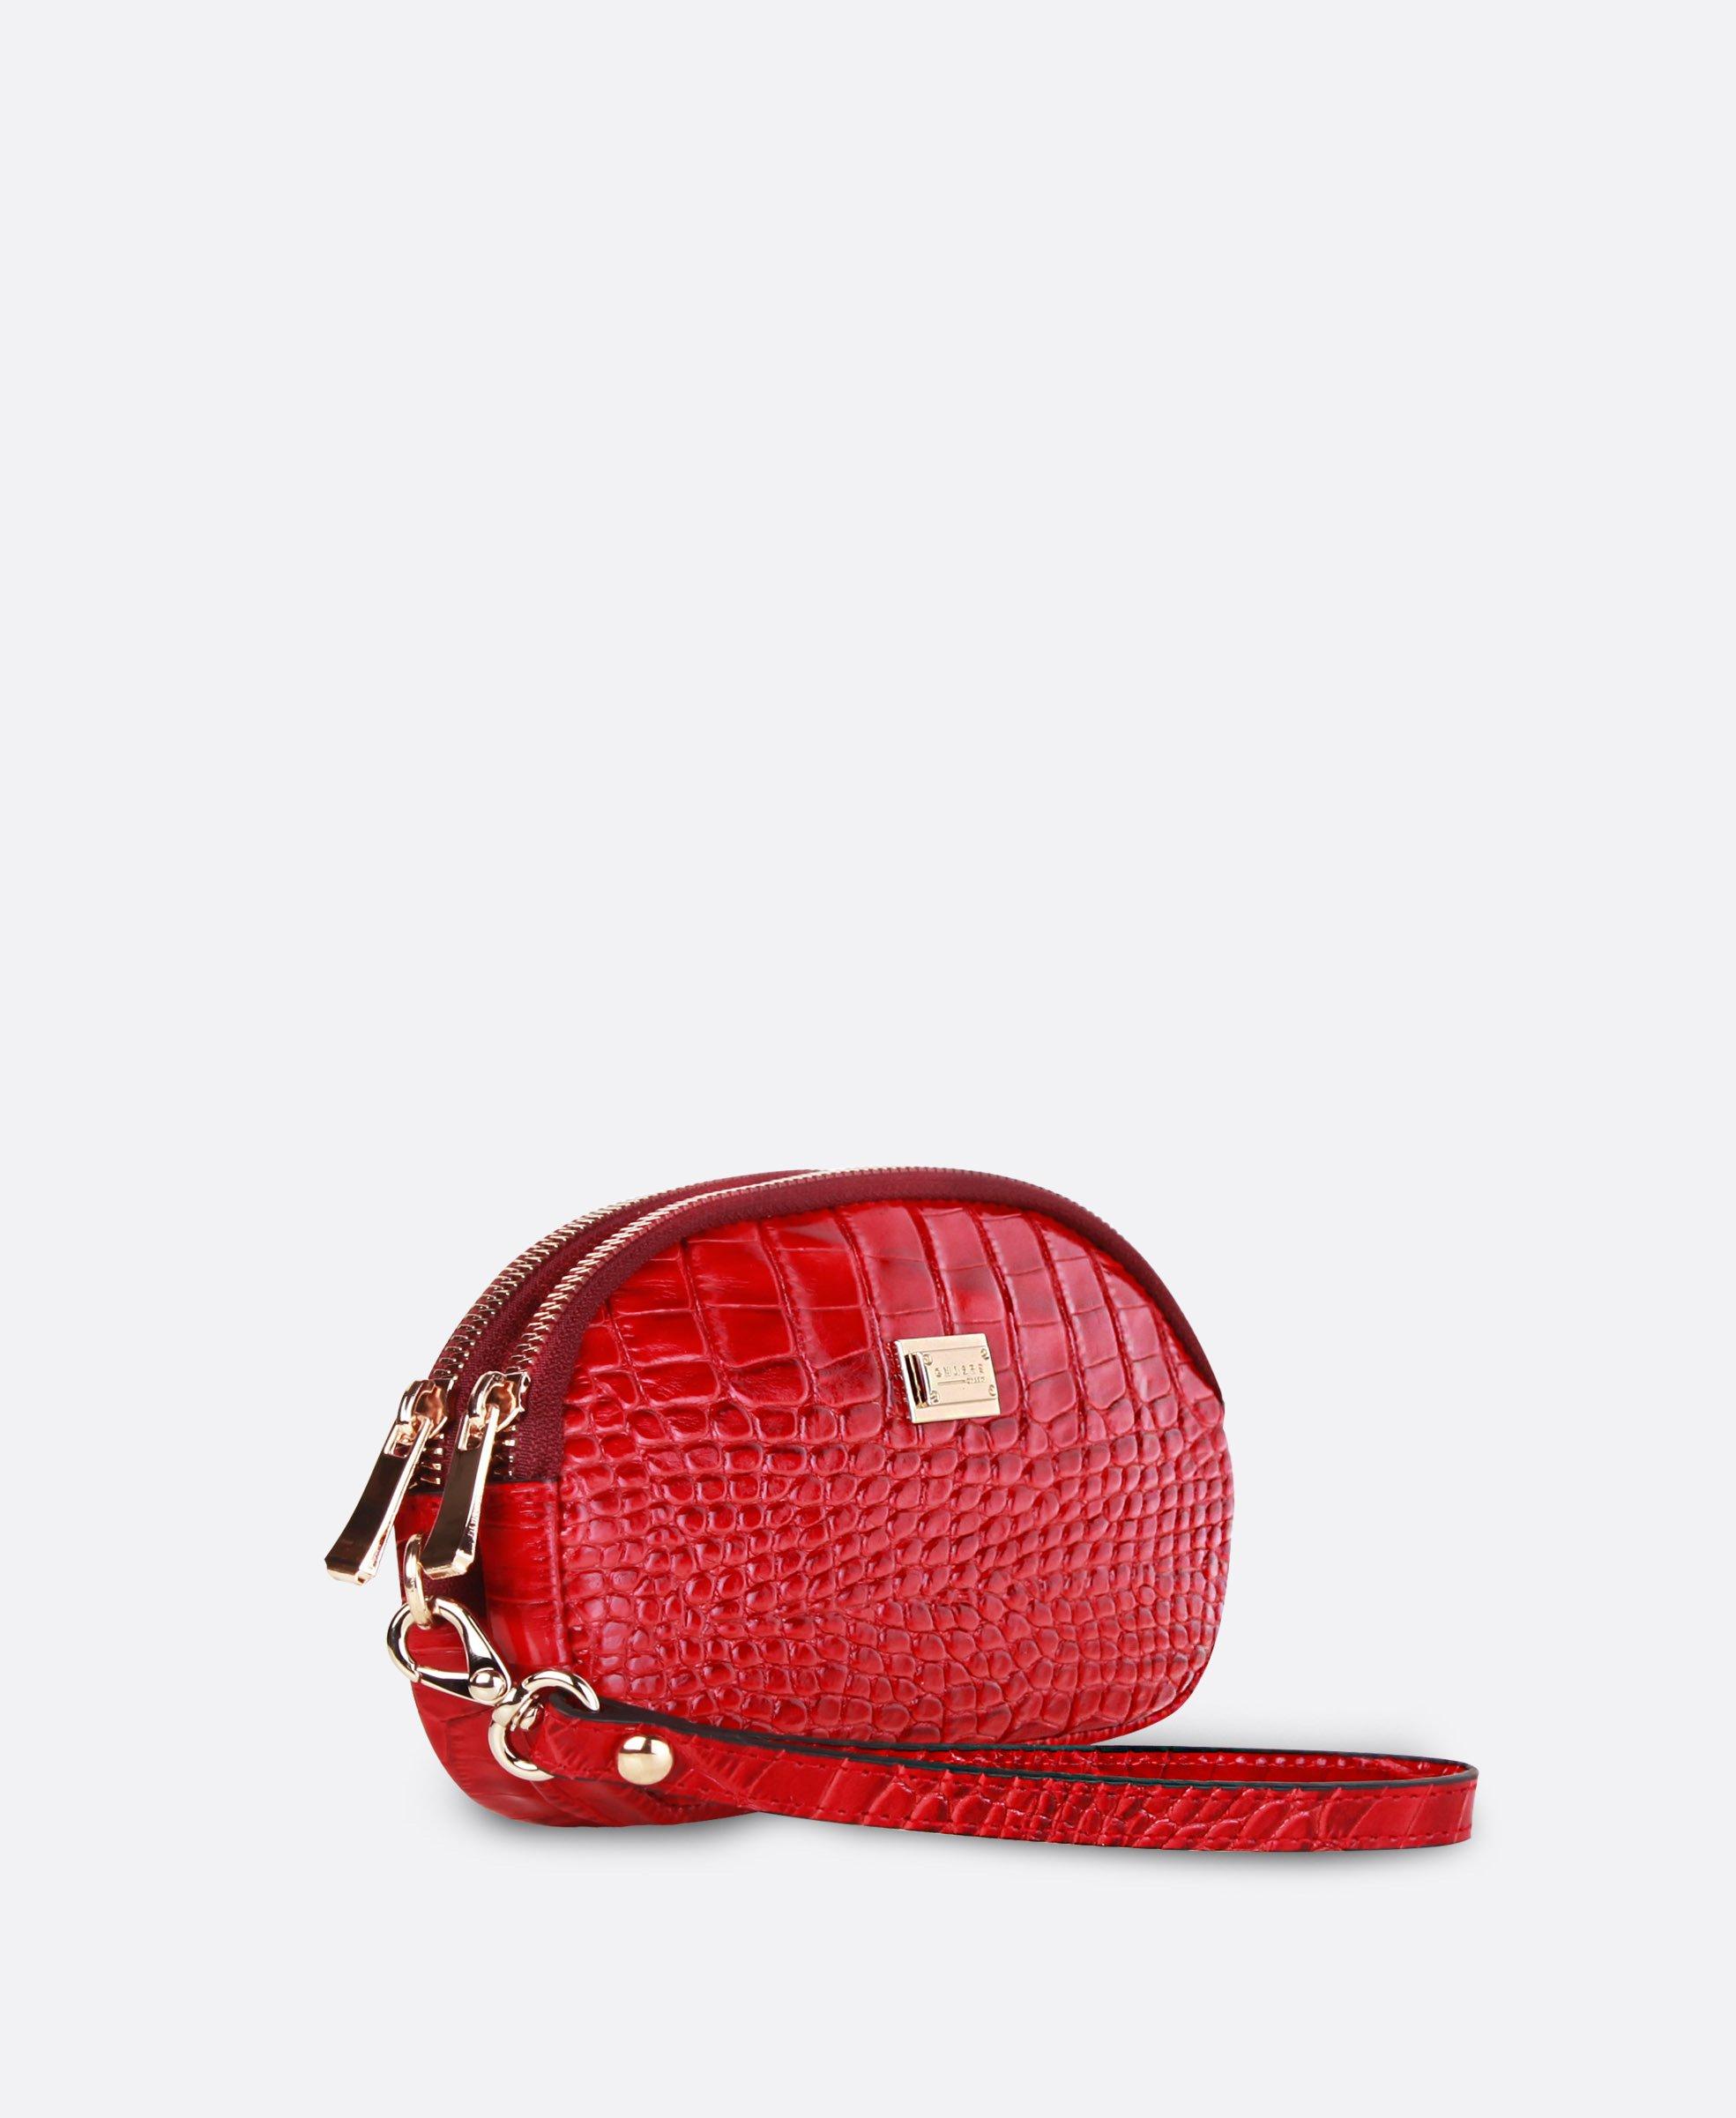 کیف پول دستی زنانه چرم 2596